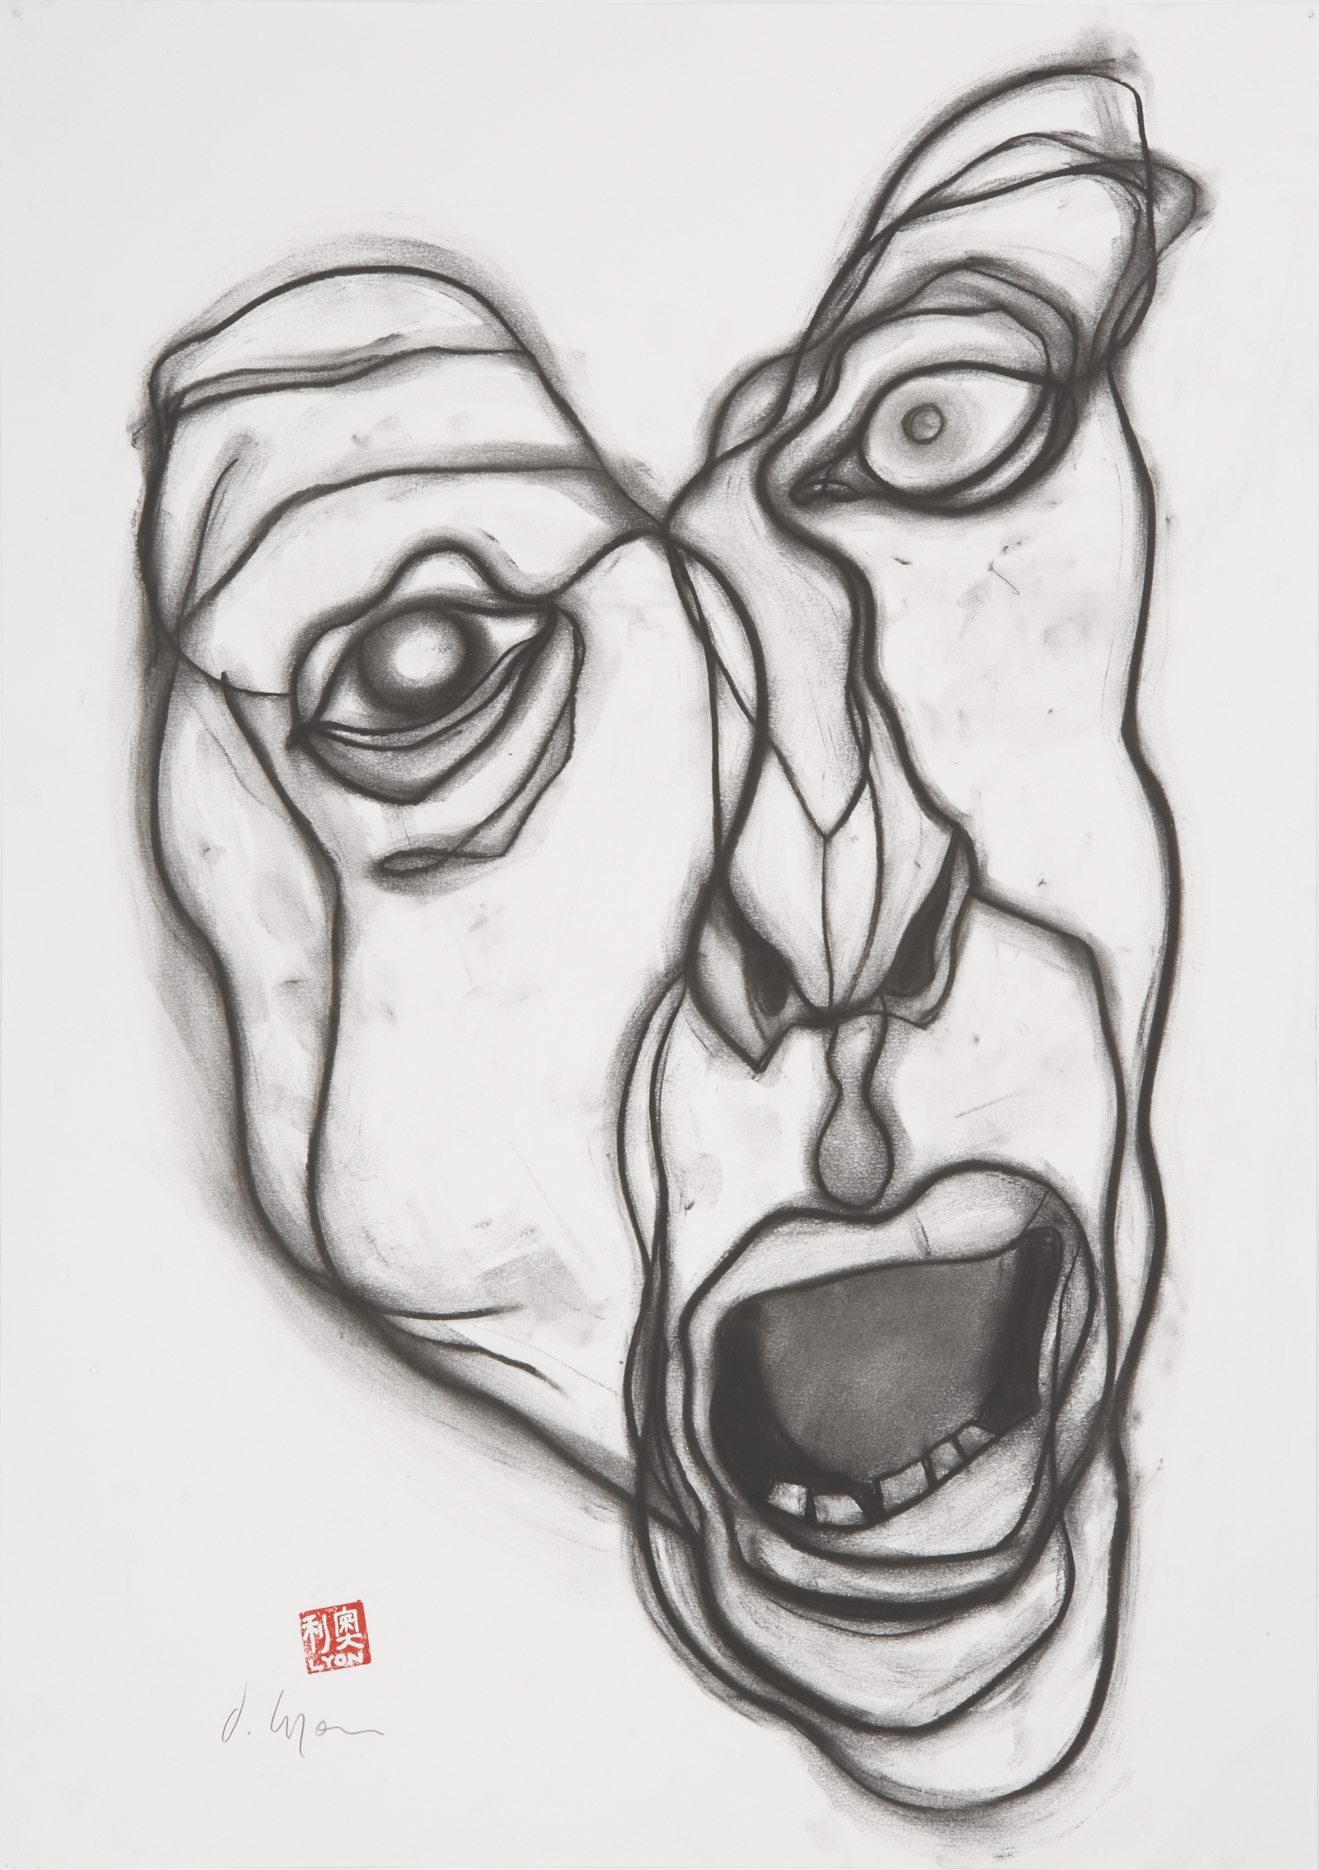 Face 4 Charcoal - 007 - 150dpi.jpg